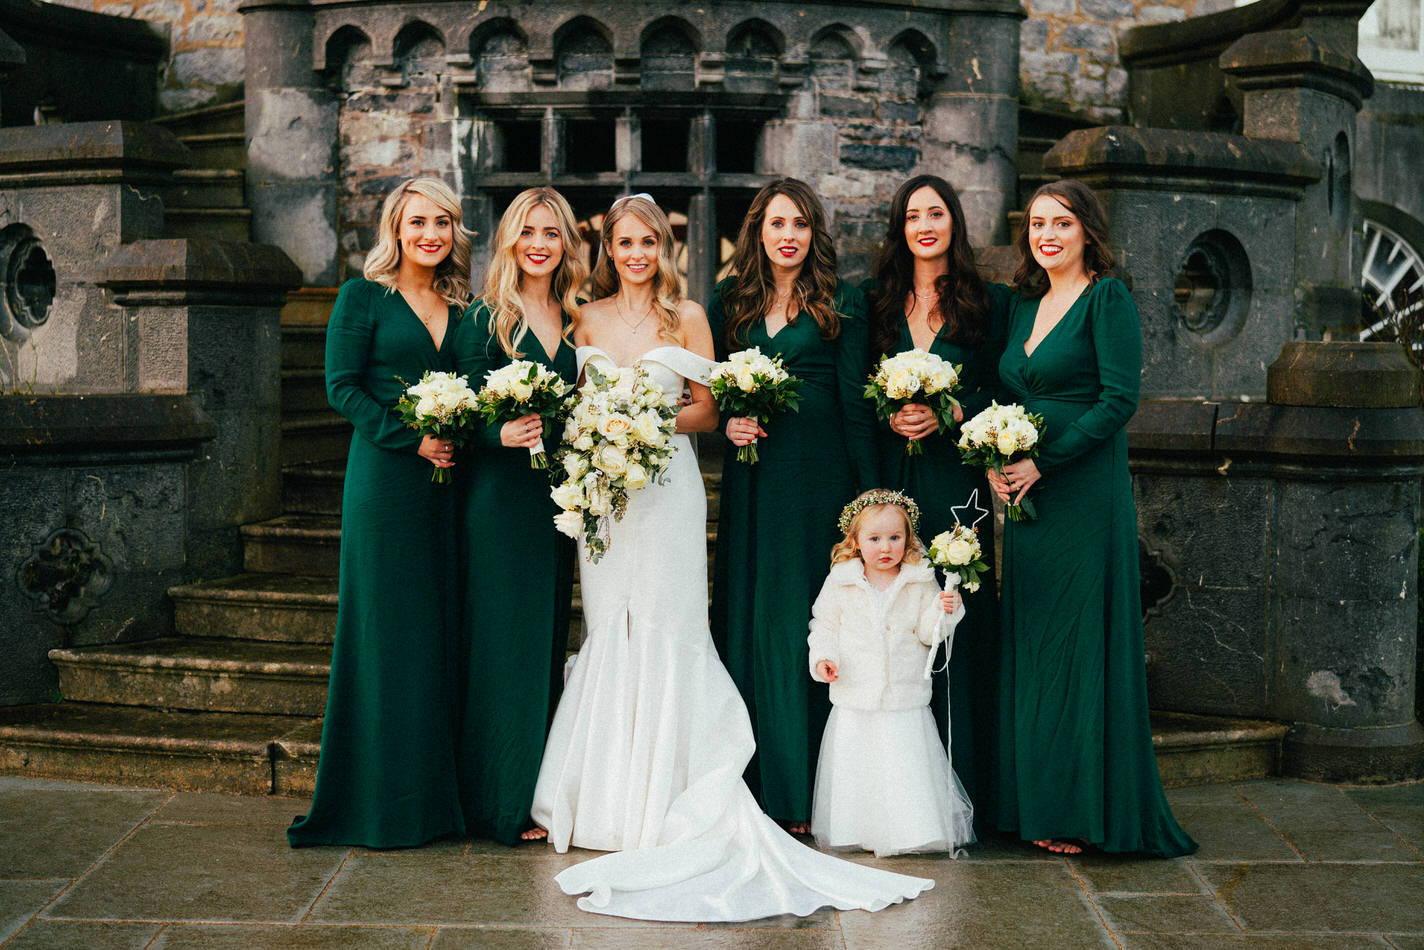 Castle-wedding-ireland-photos- 0210 151